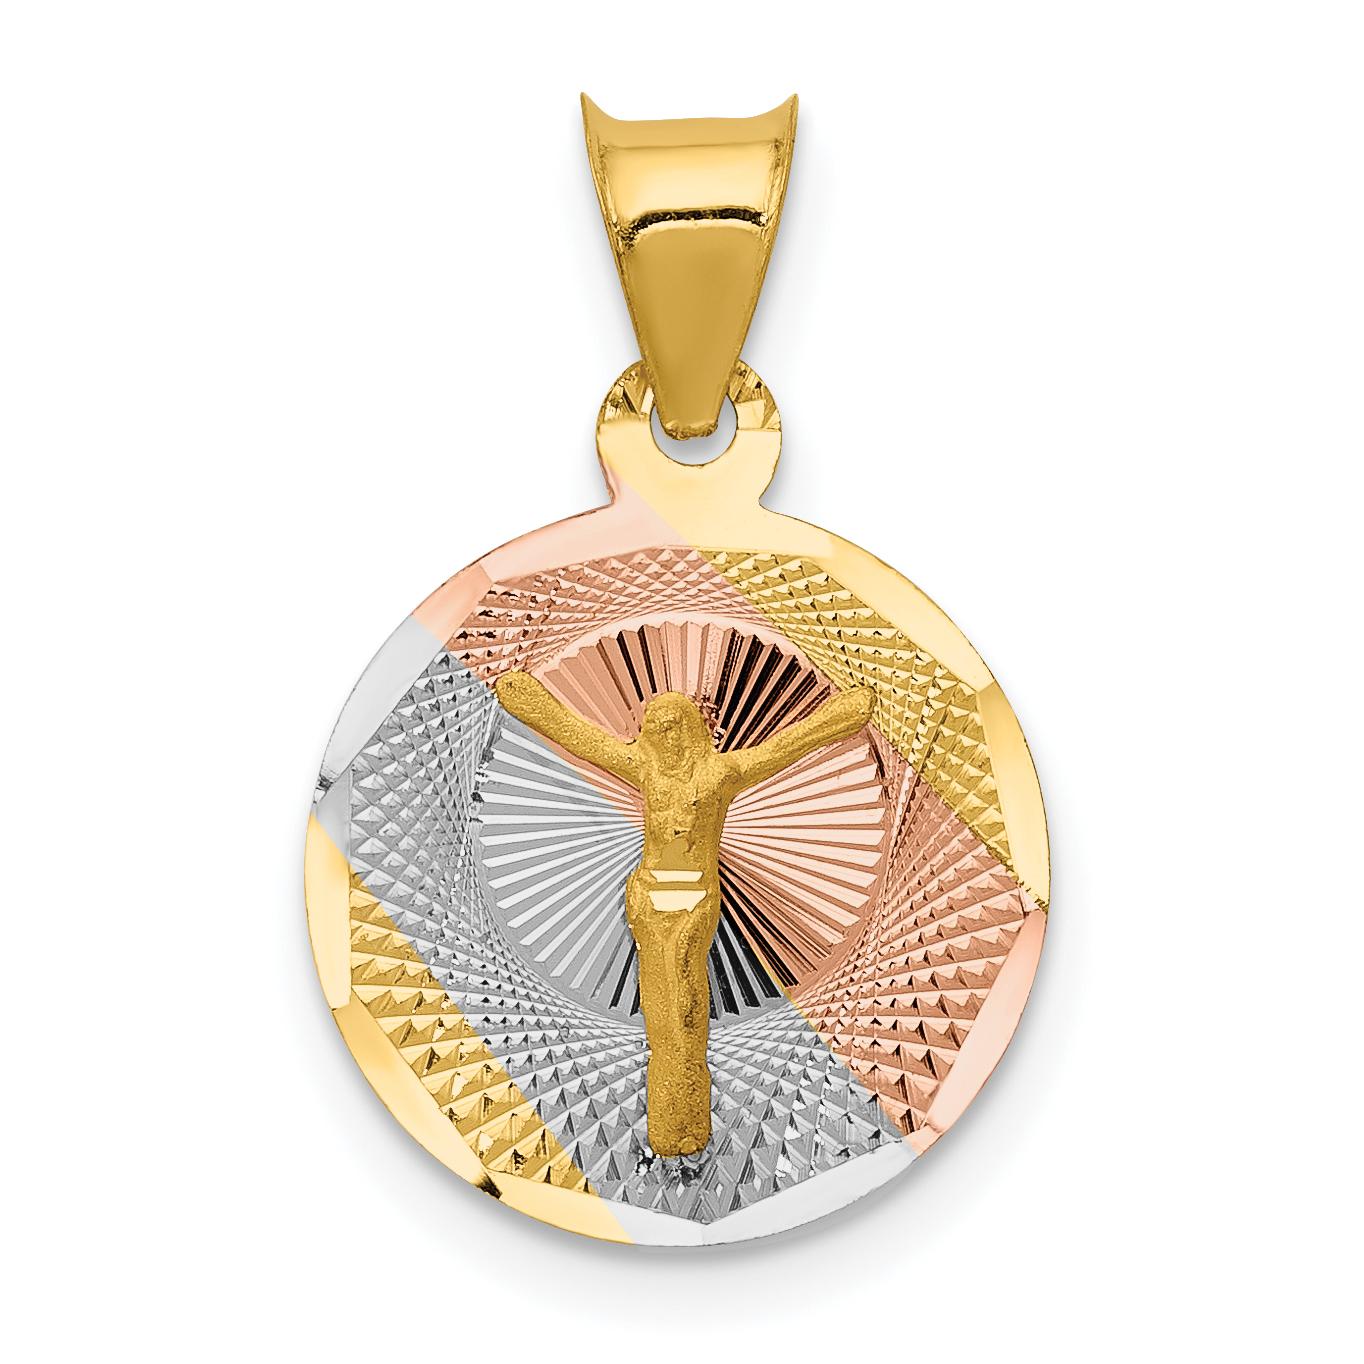 14K Rhodium Plated Yellow Gold & Rhodium Polished & Diamond Cut CORPUS Circle Pendant - image 2 de 2